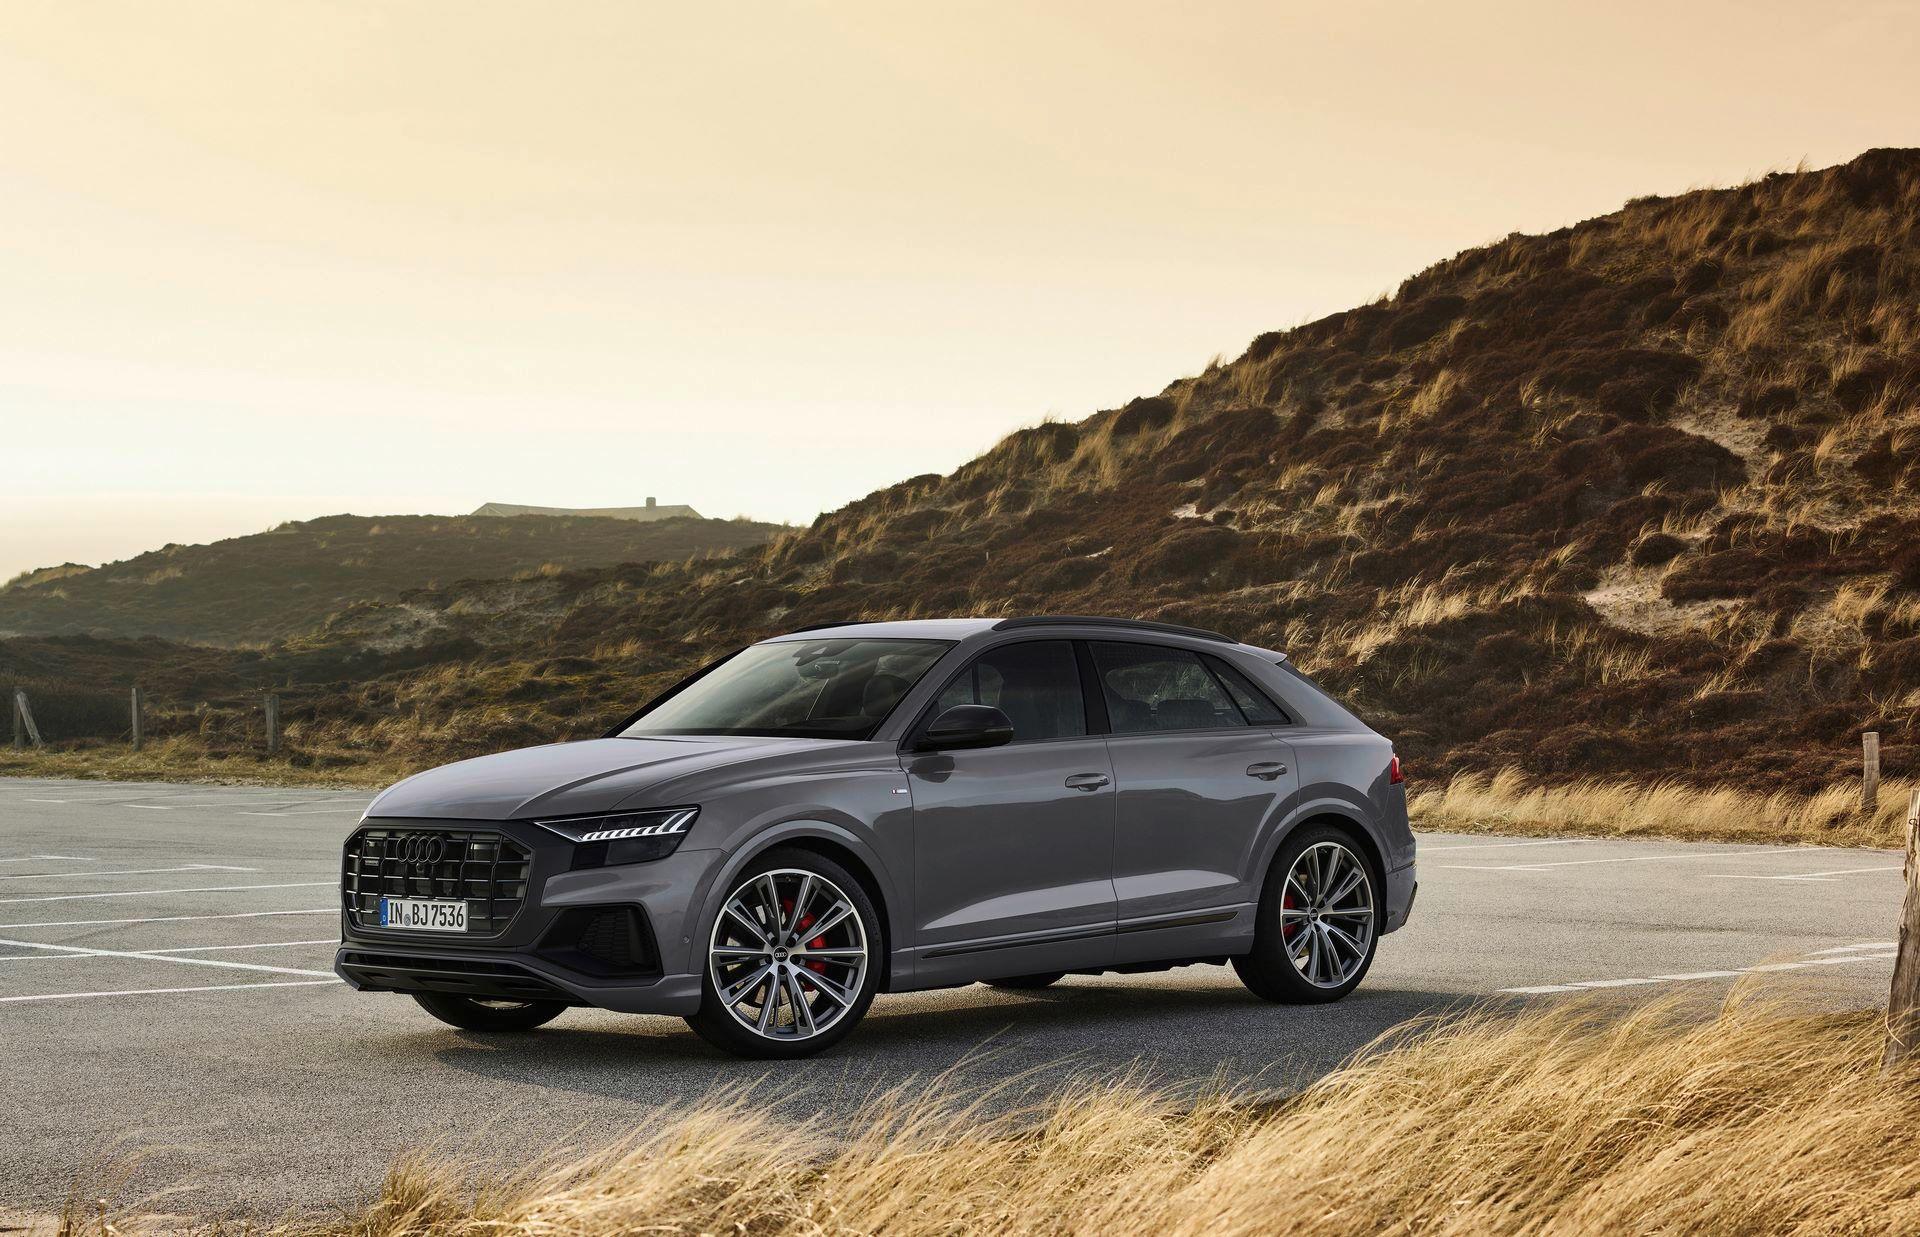 Audi-A4-A5-Q7-Q8-Competition-And-Competition-Plus-Trims-19